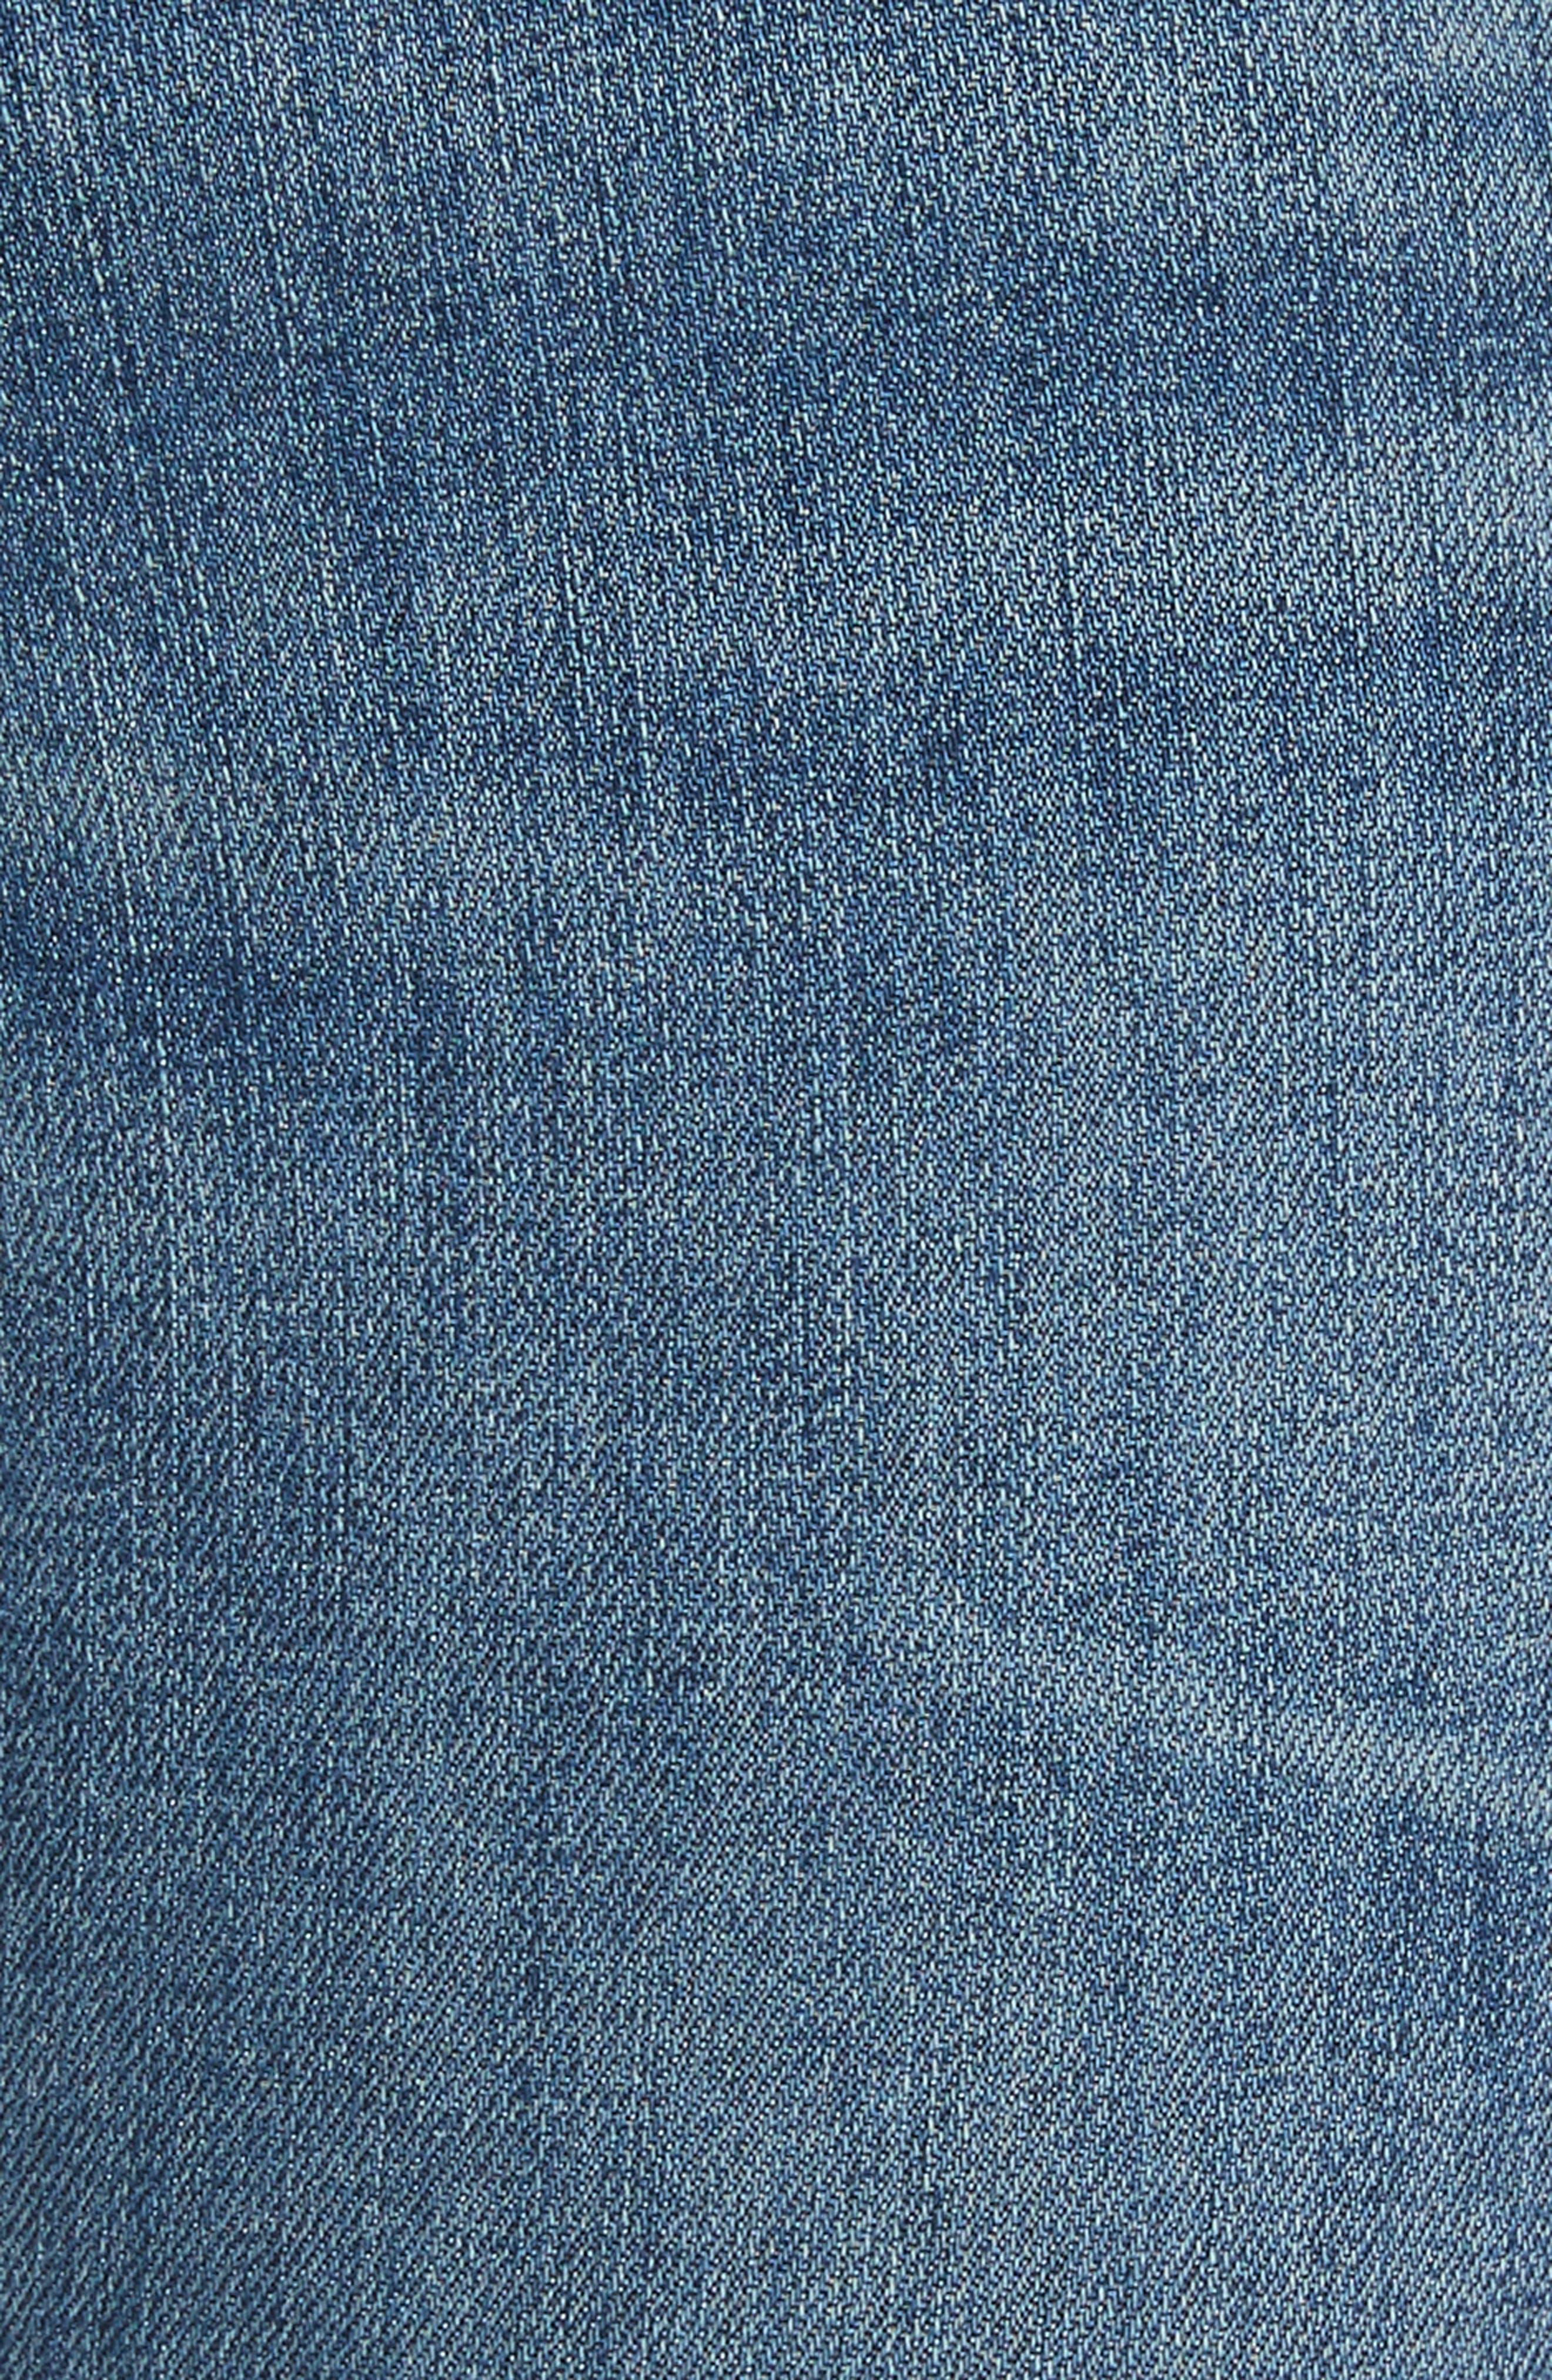 Skinny Jeans,                             Alternate thumbnail 5, color,                             402